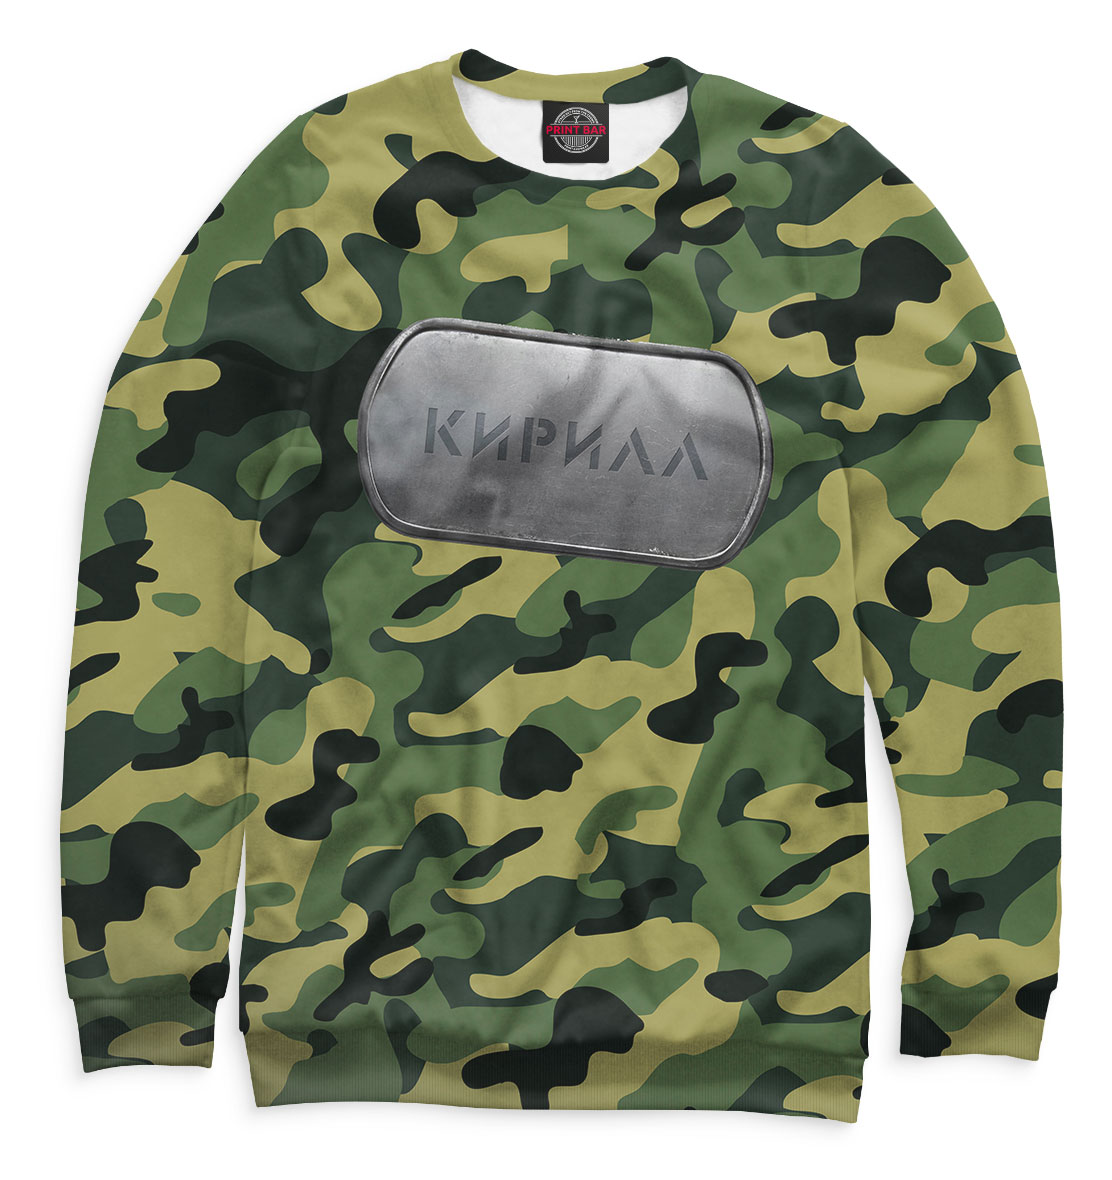 Купить Военный Кирилл, Printbar, Свитшоты, KIR-381826-swi-2